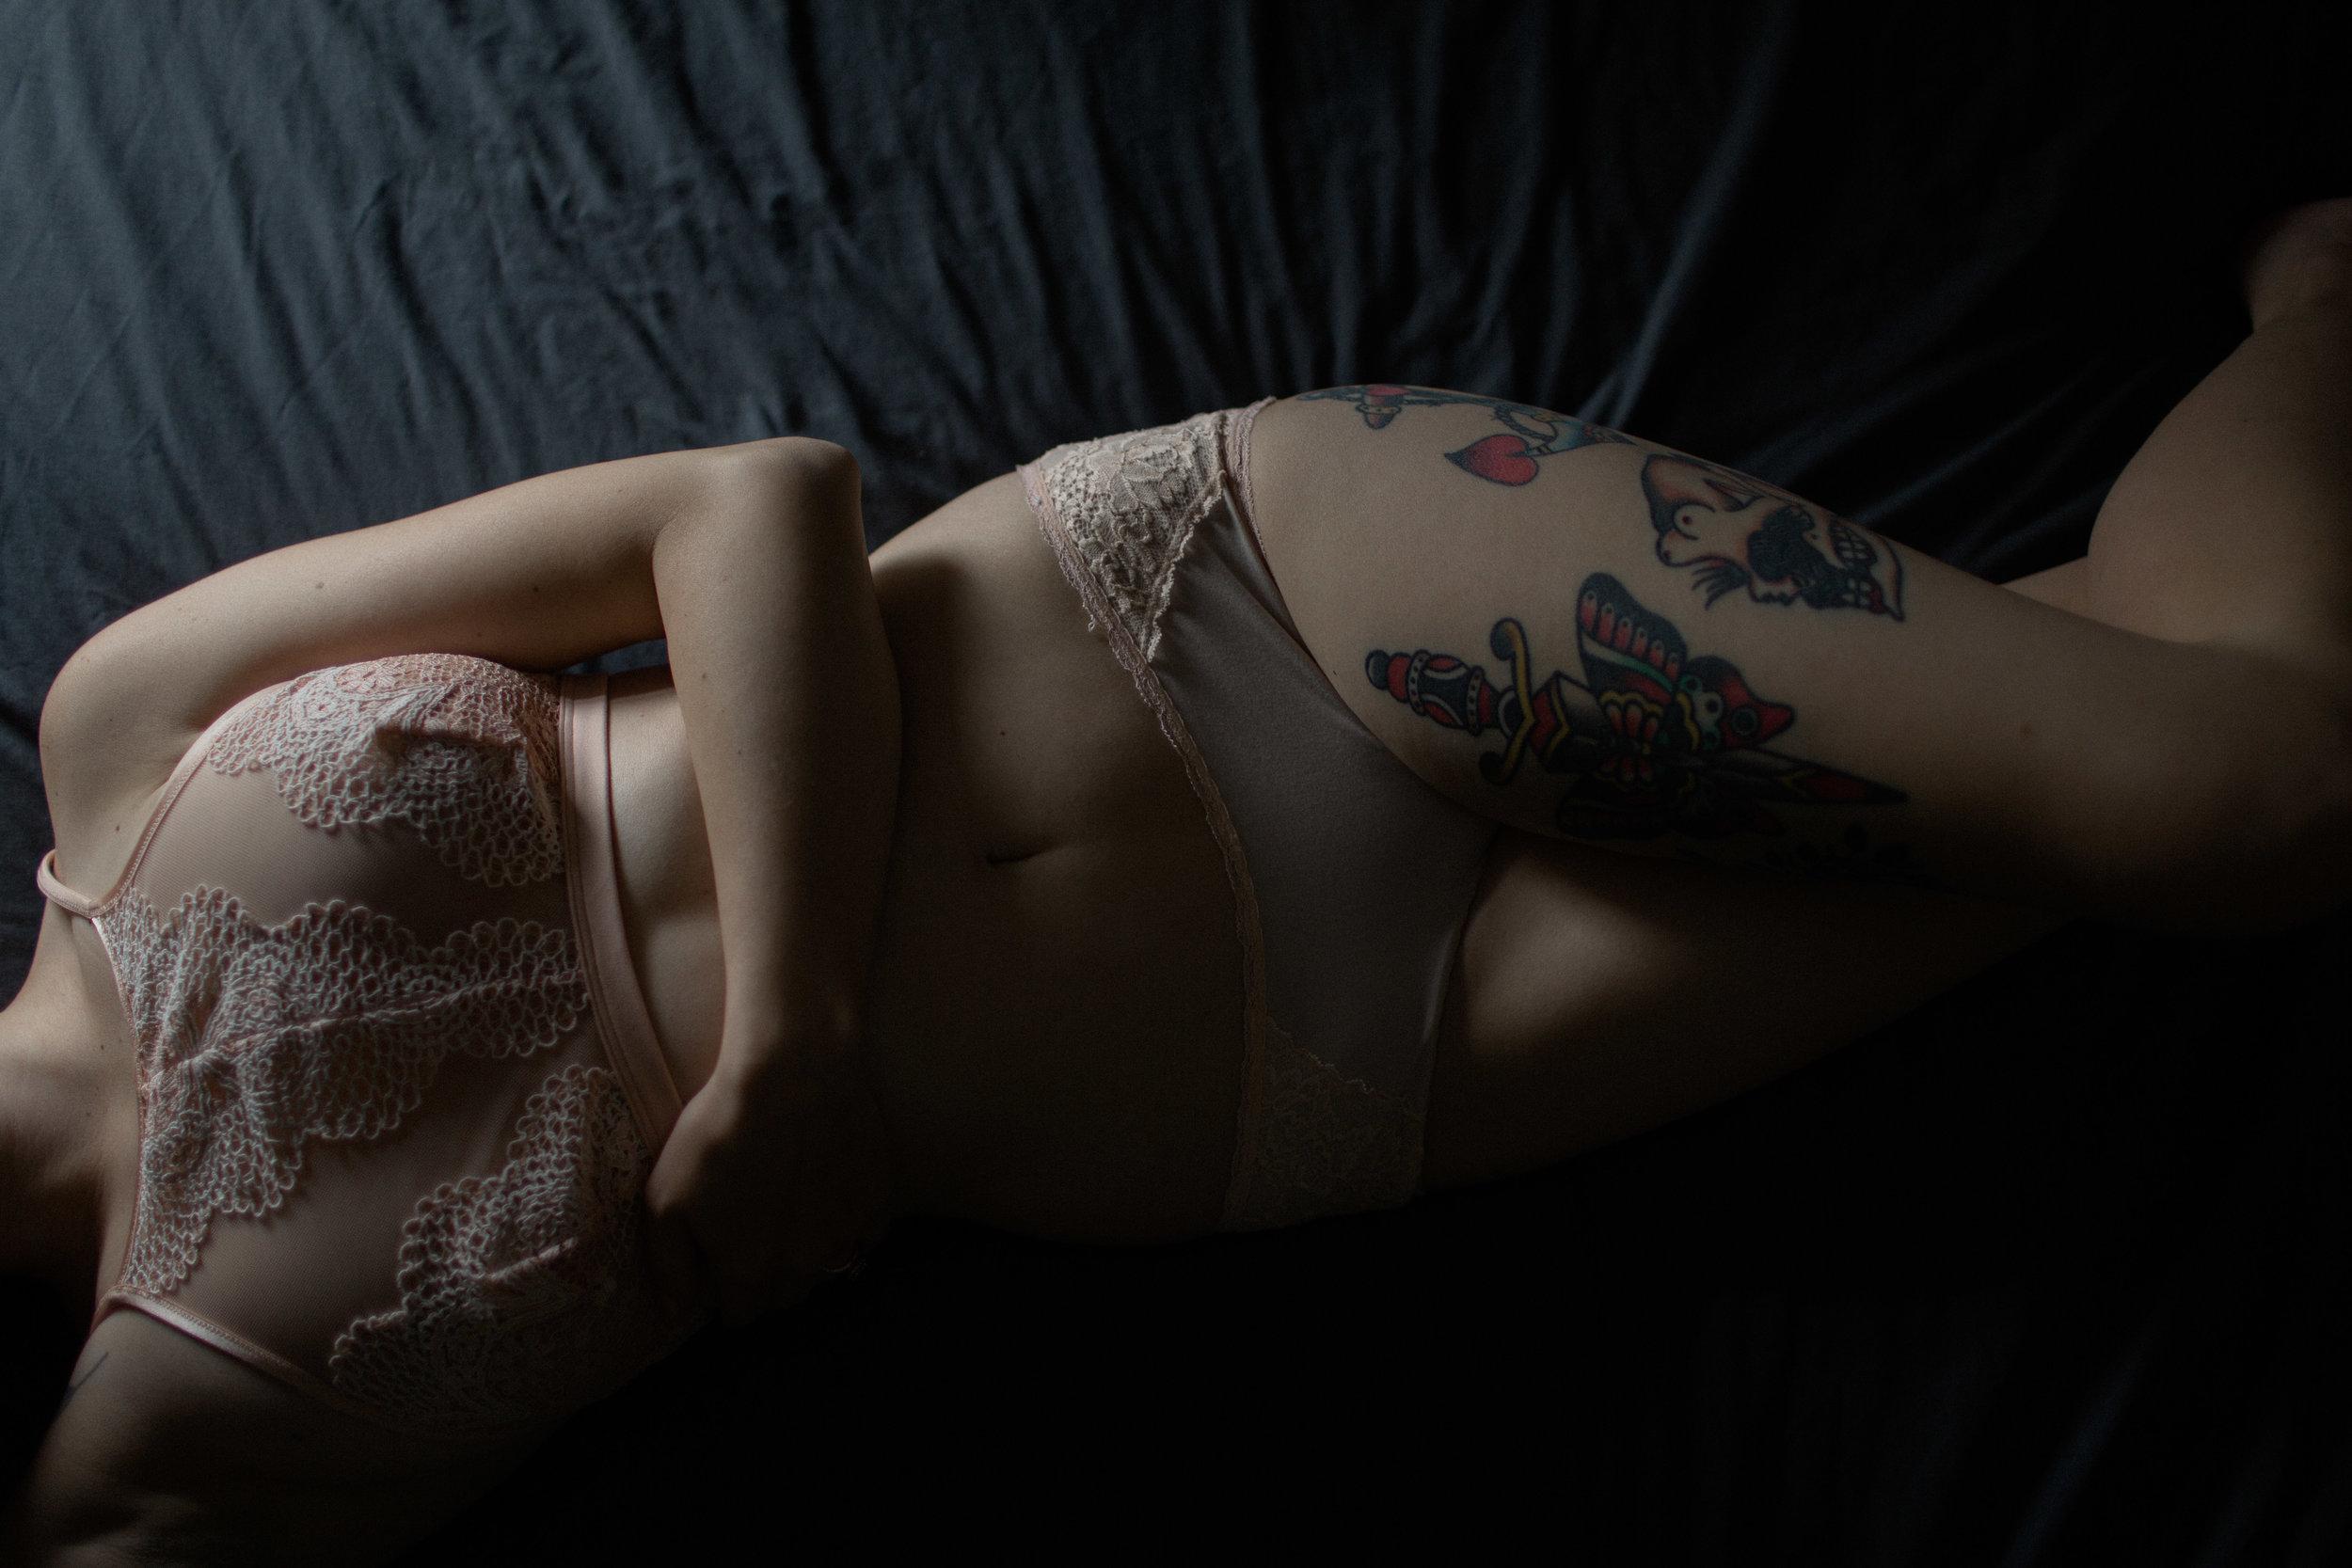 indianapolis boudoir photographer. fort wayne boudoir photographer. moody boudoir photography inspiration. intimate lifestyle photography. sarah rose photography. i am sarah rose.